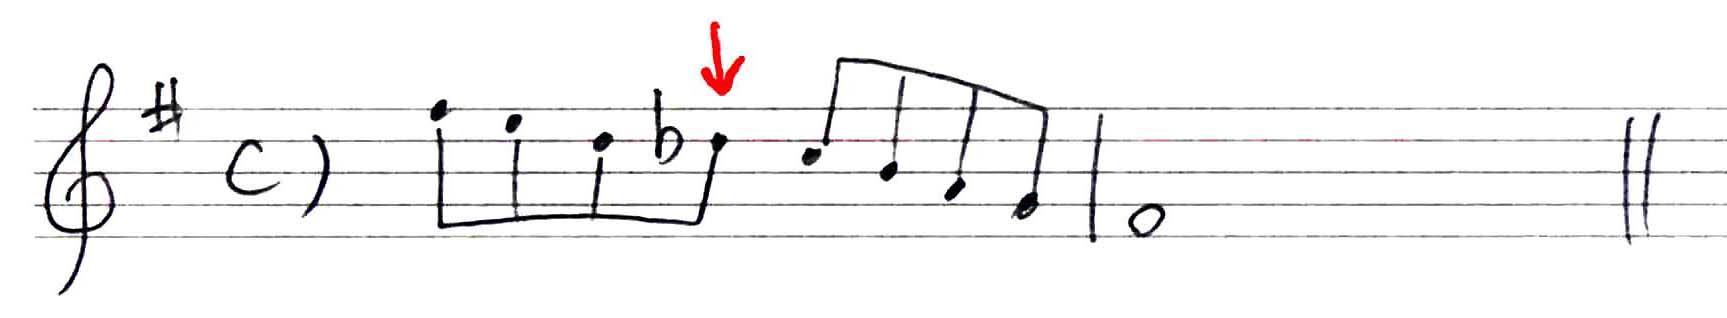 transposition-2